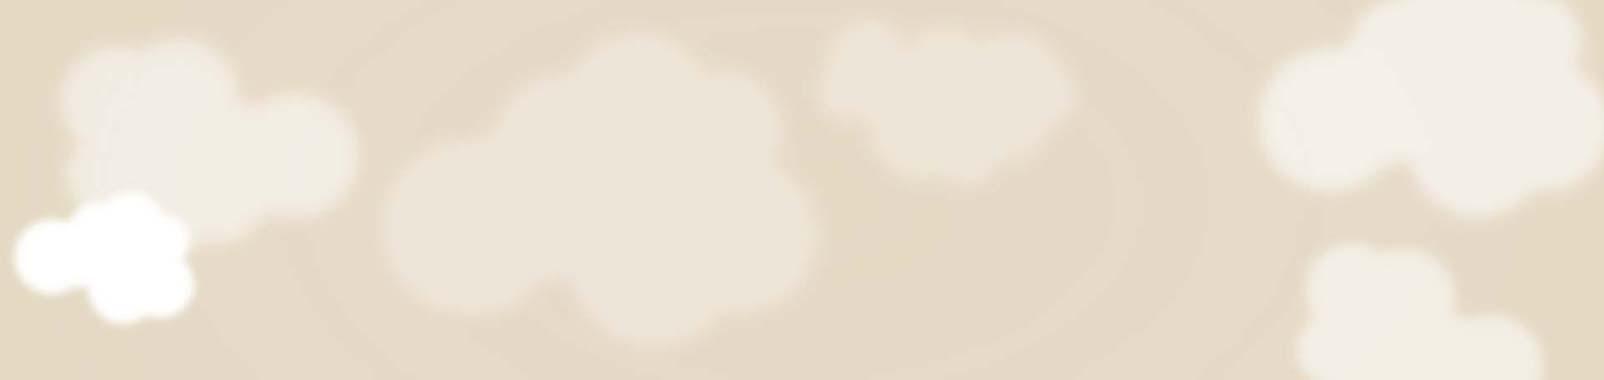 banner_1_fondo